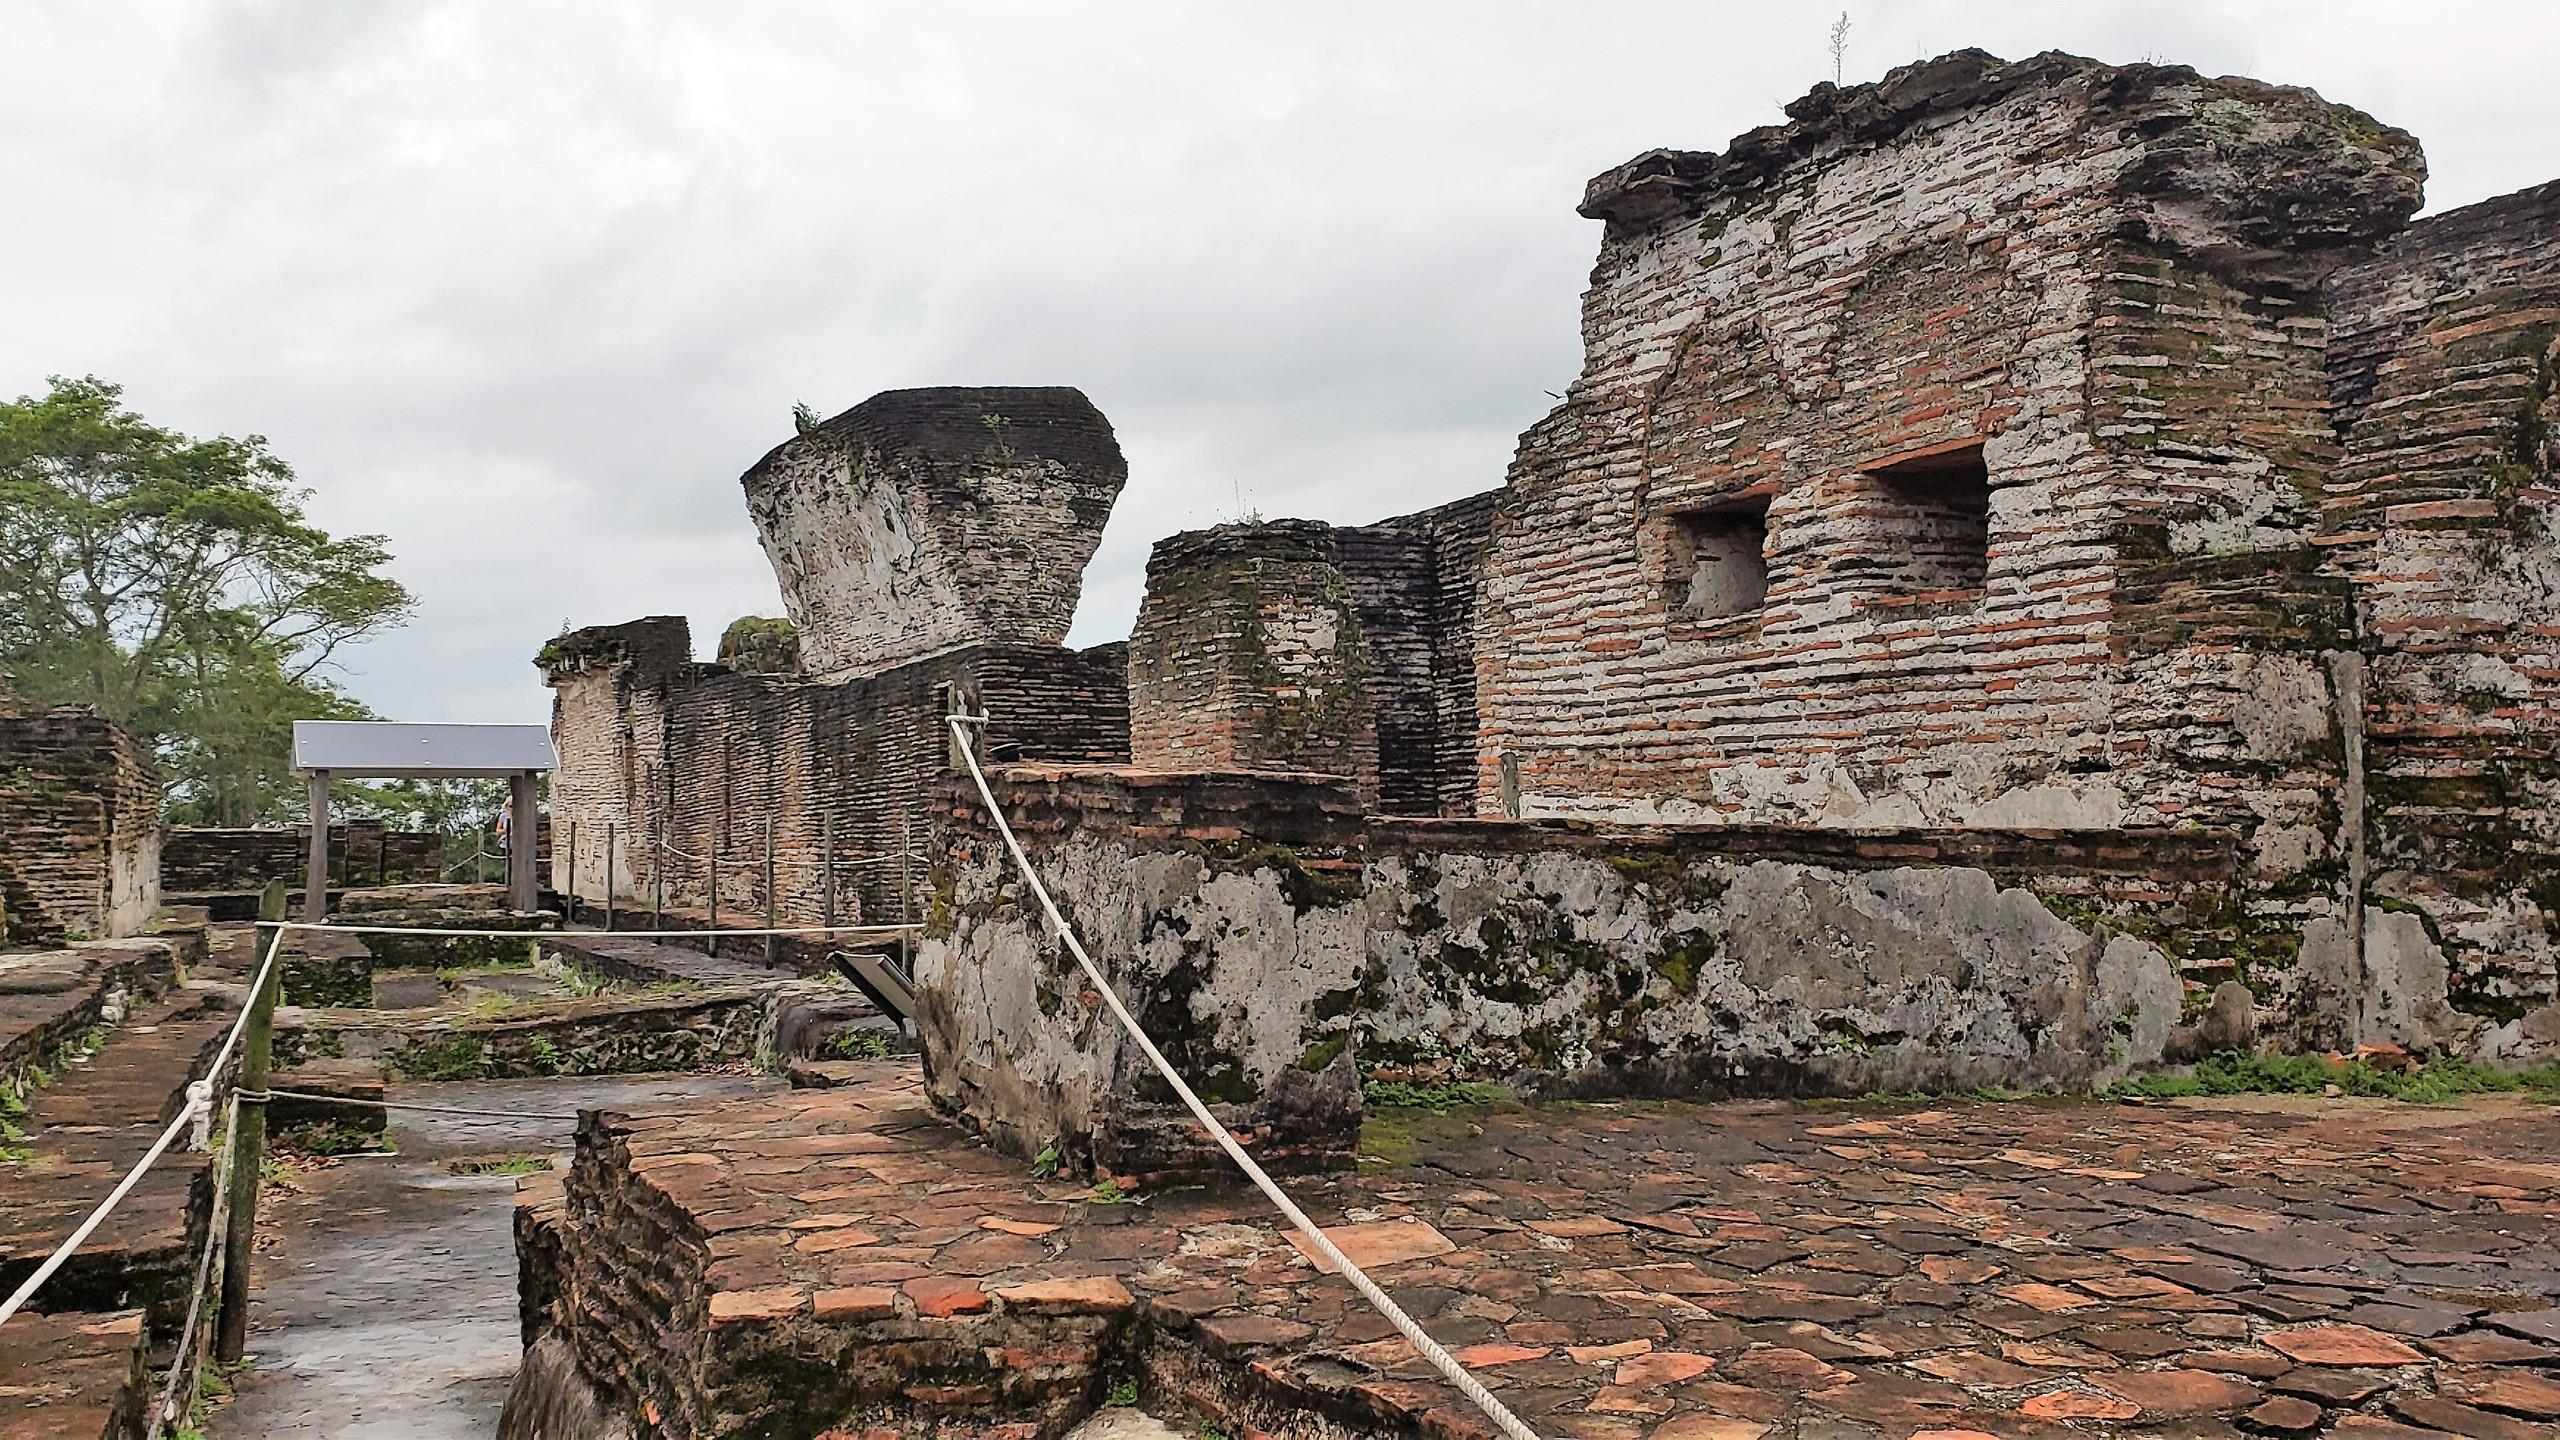 Residences of the upper acropolis, Comalcalco